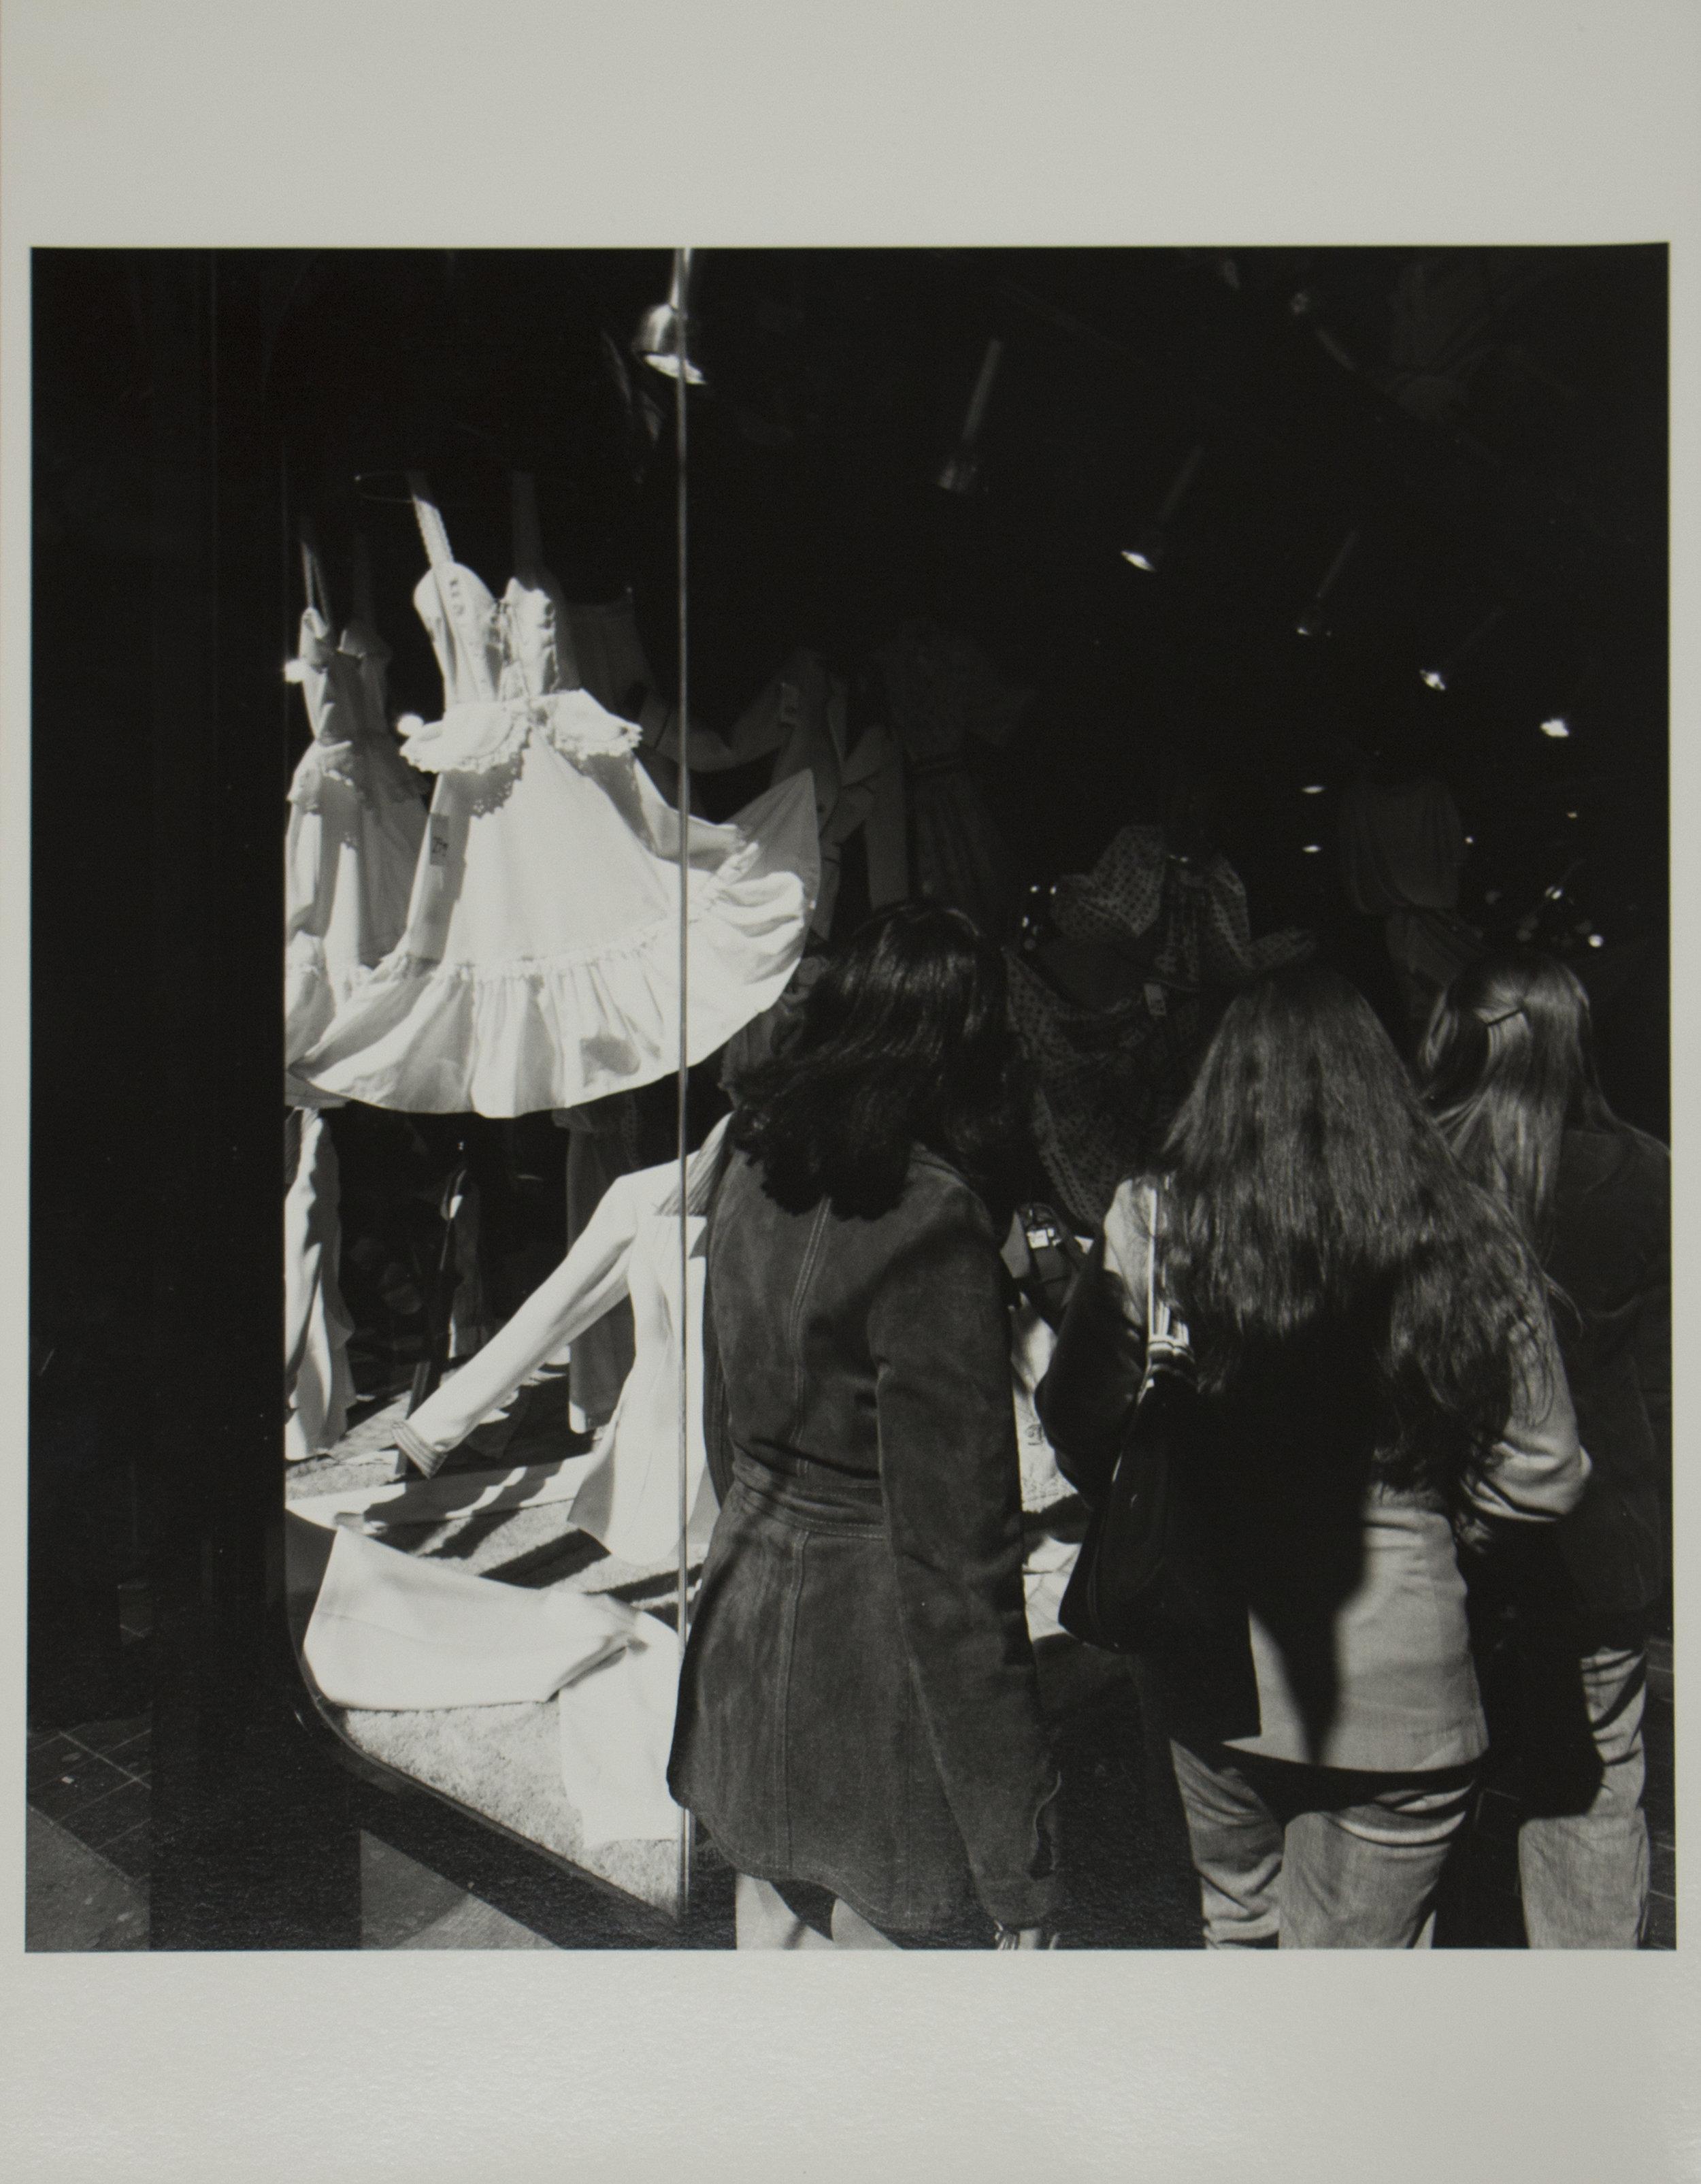 Untitled   c. 1970  vintage silver gelatin print  14 x 11 inches; 35.6 x 27.9 centimeters